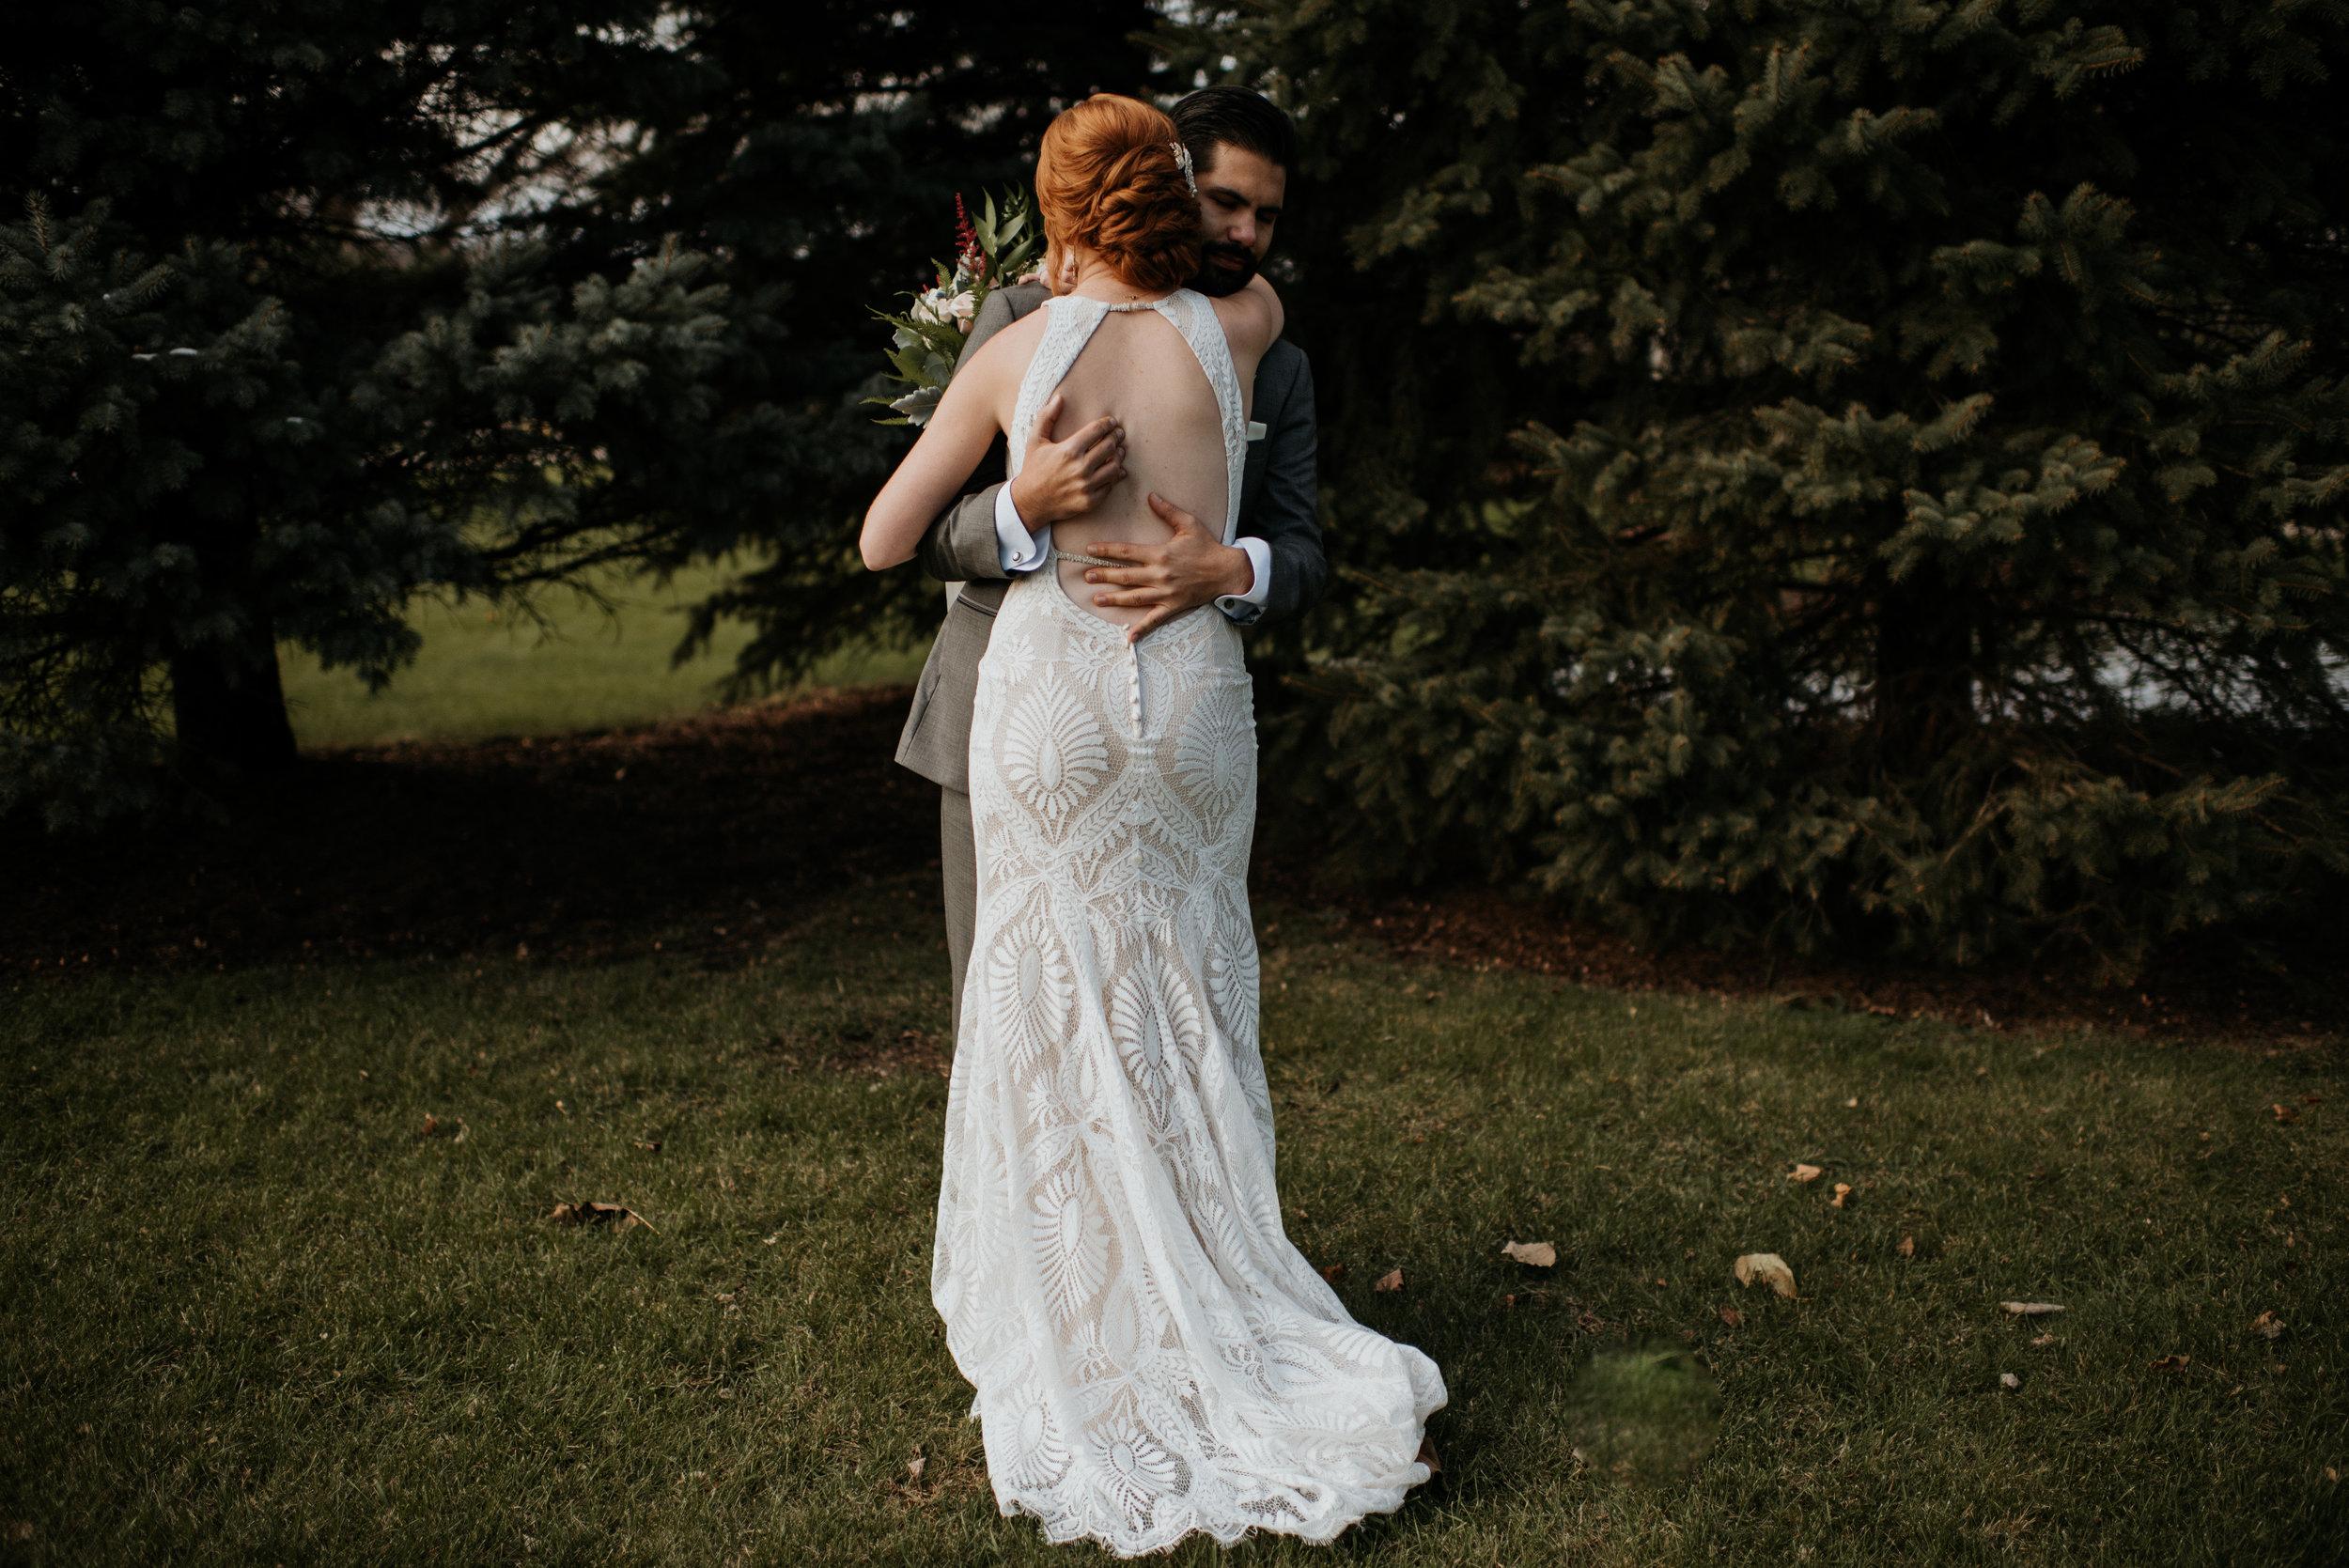 The Brix on Fox, Chicago Wedding Photographer, Zach and Rosalie00033.jpg